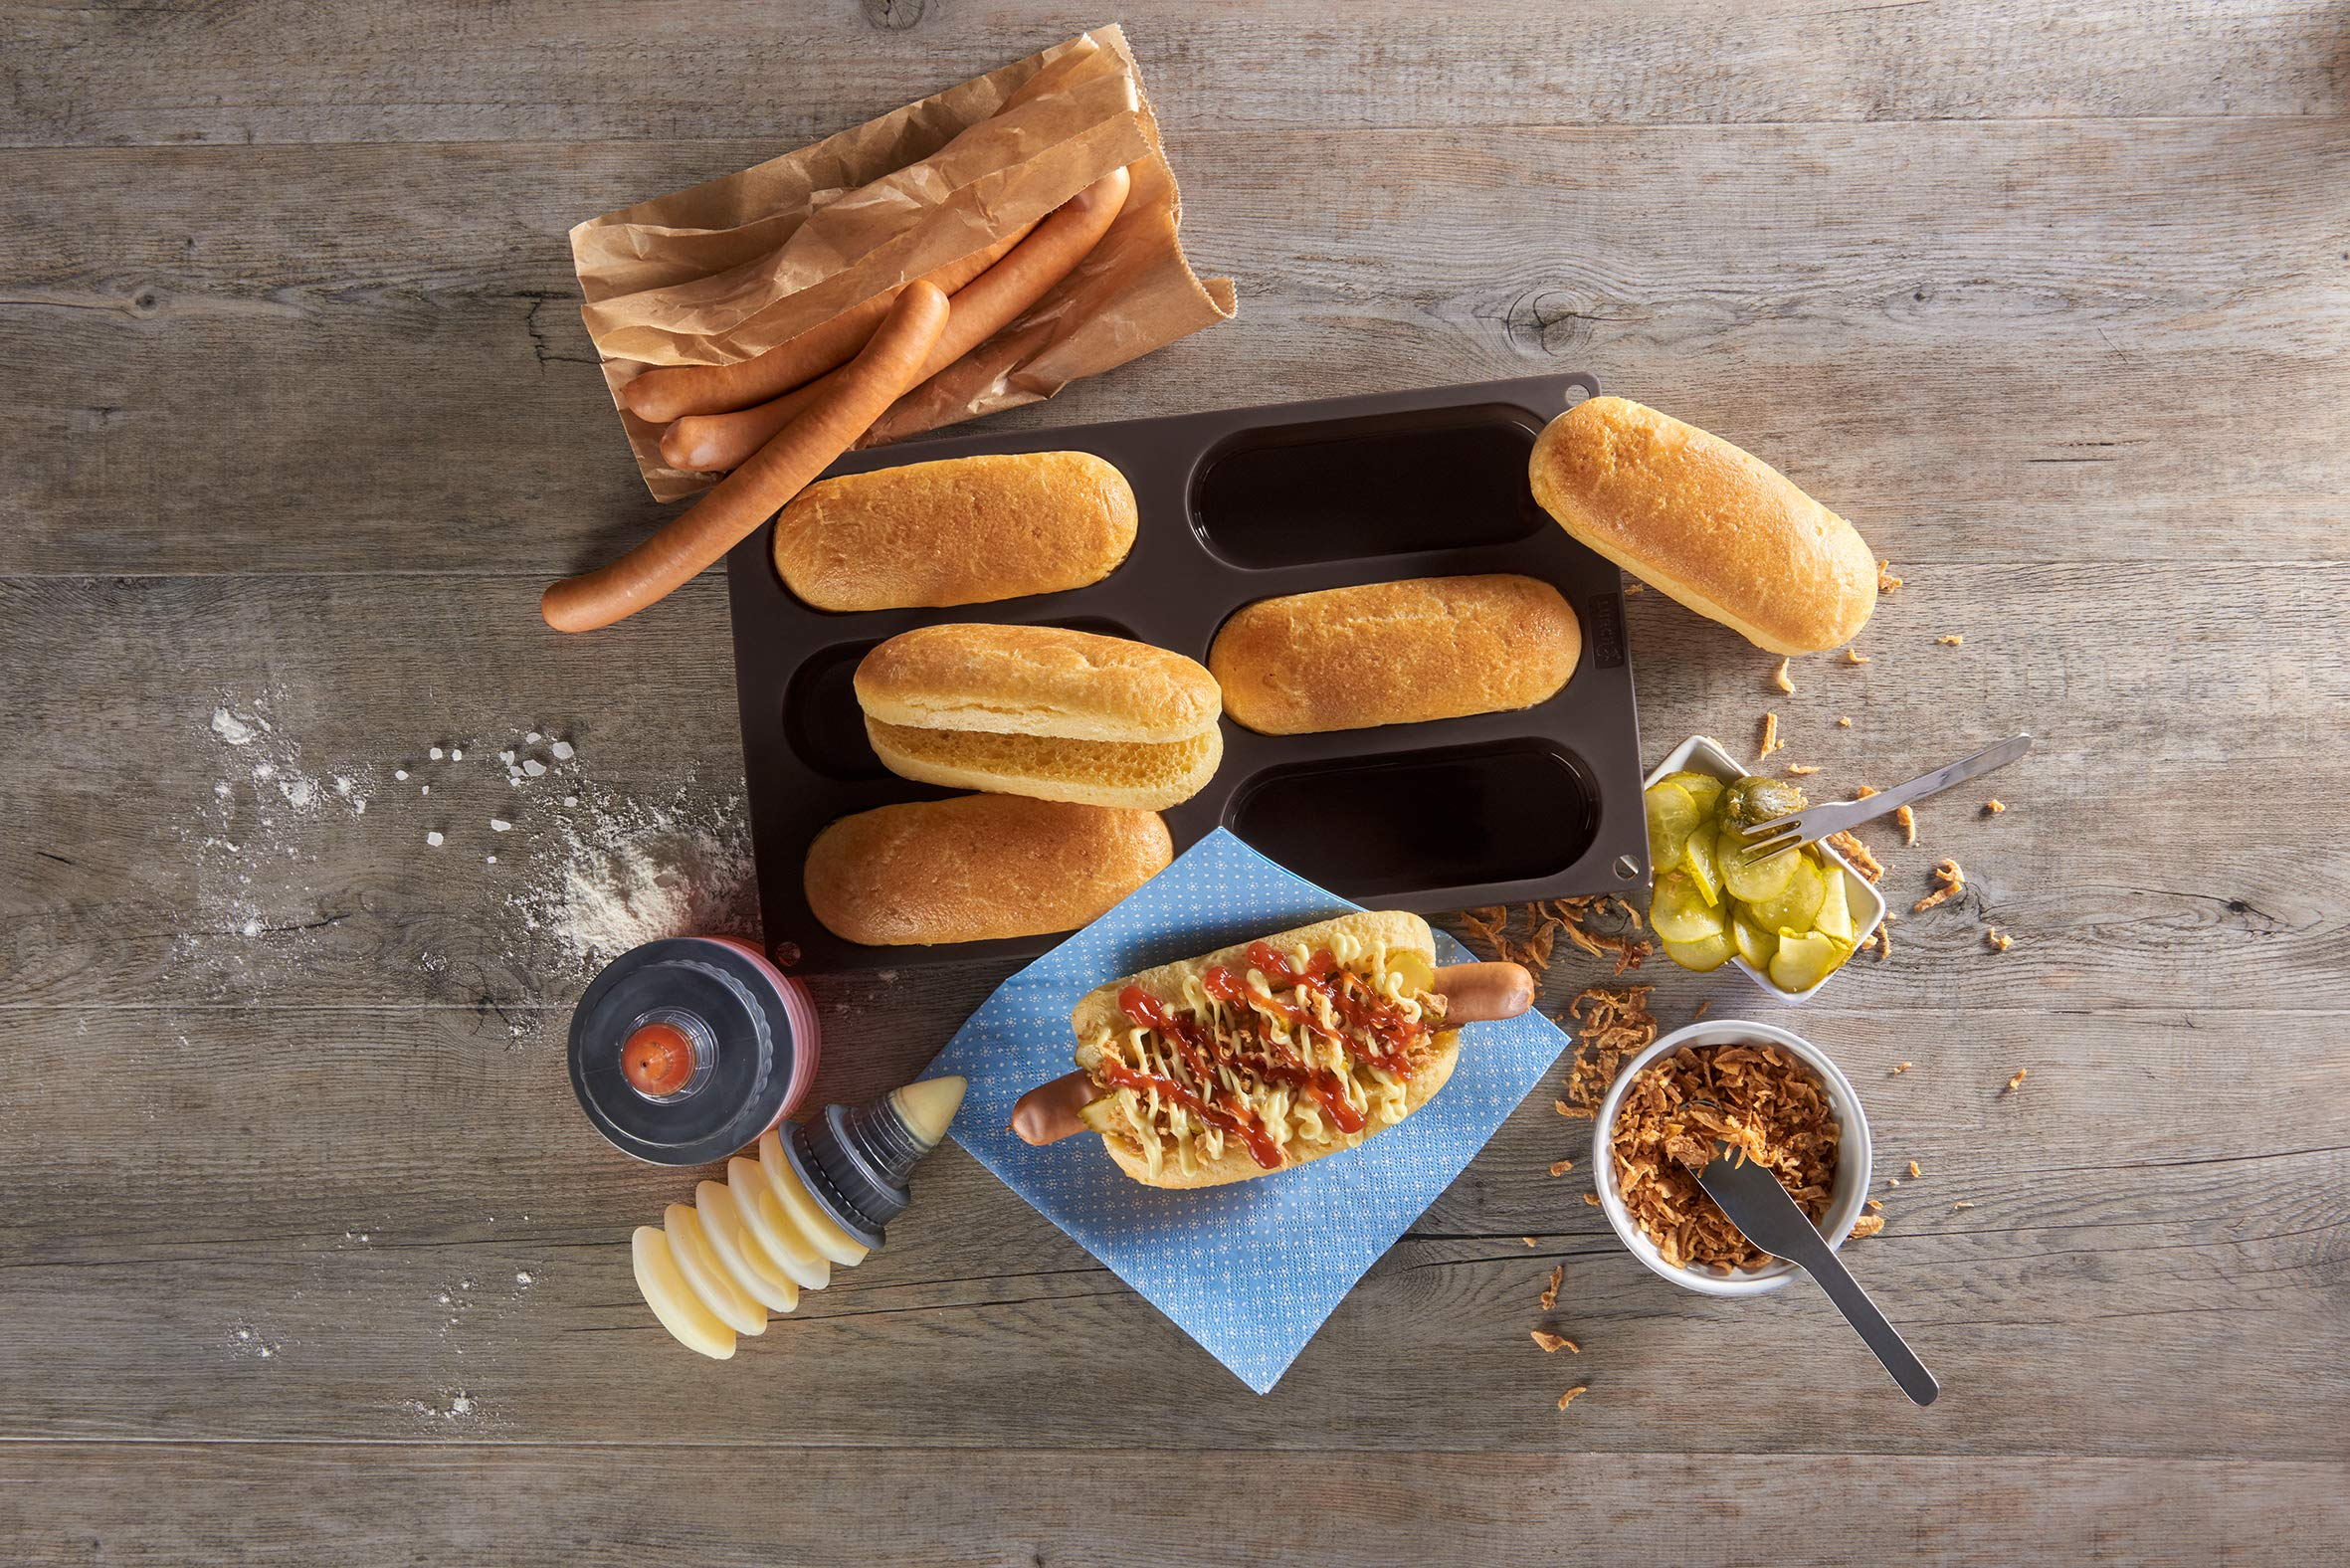 8 Gitter Brötchen Brotform Backformen Baguette Backform Laib Antihaft Hot Dog